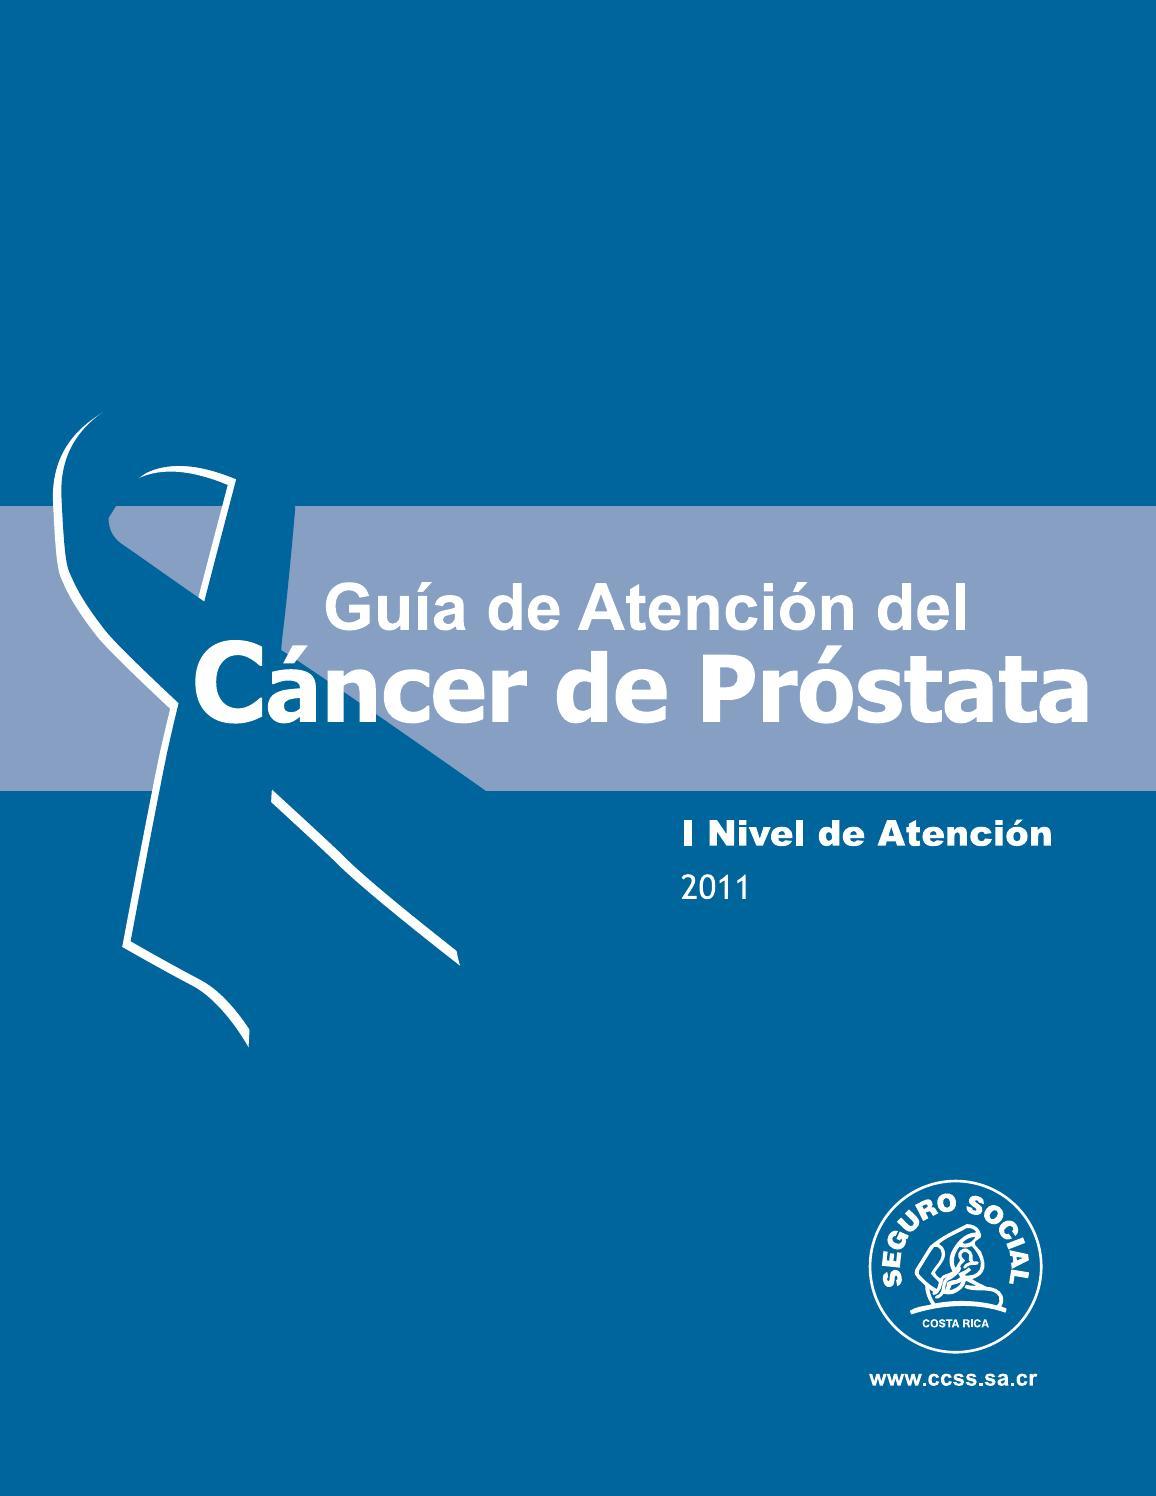 biopsia de próstata transperineal tanto como costa rica